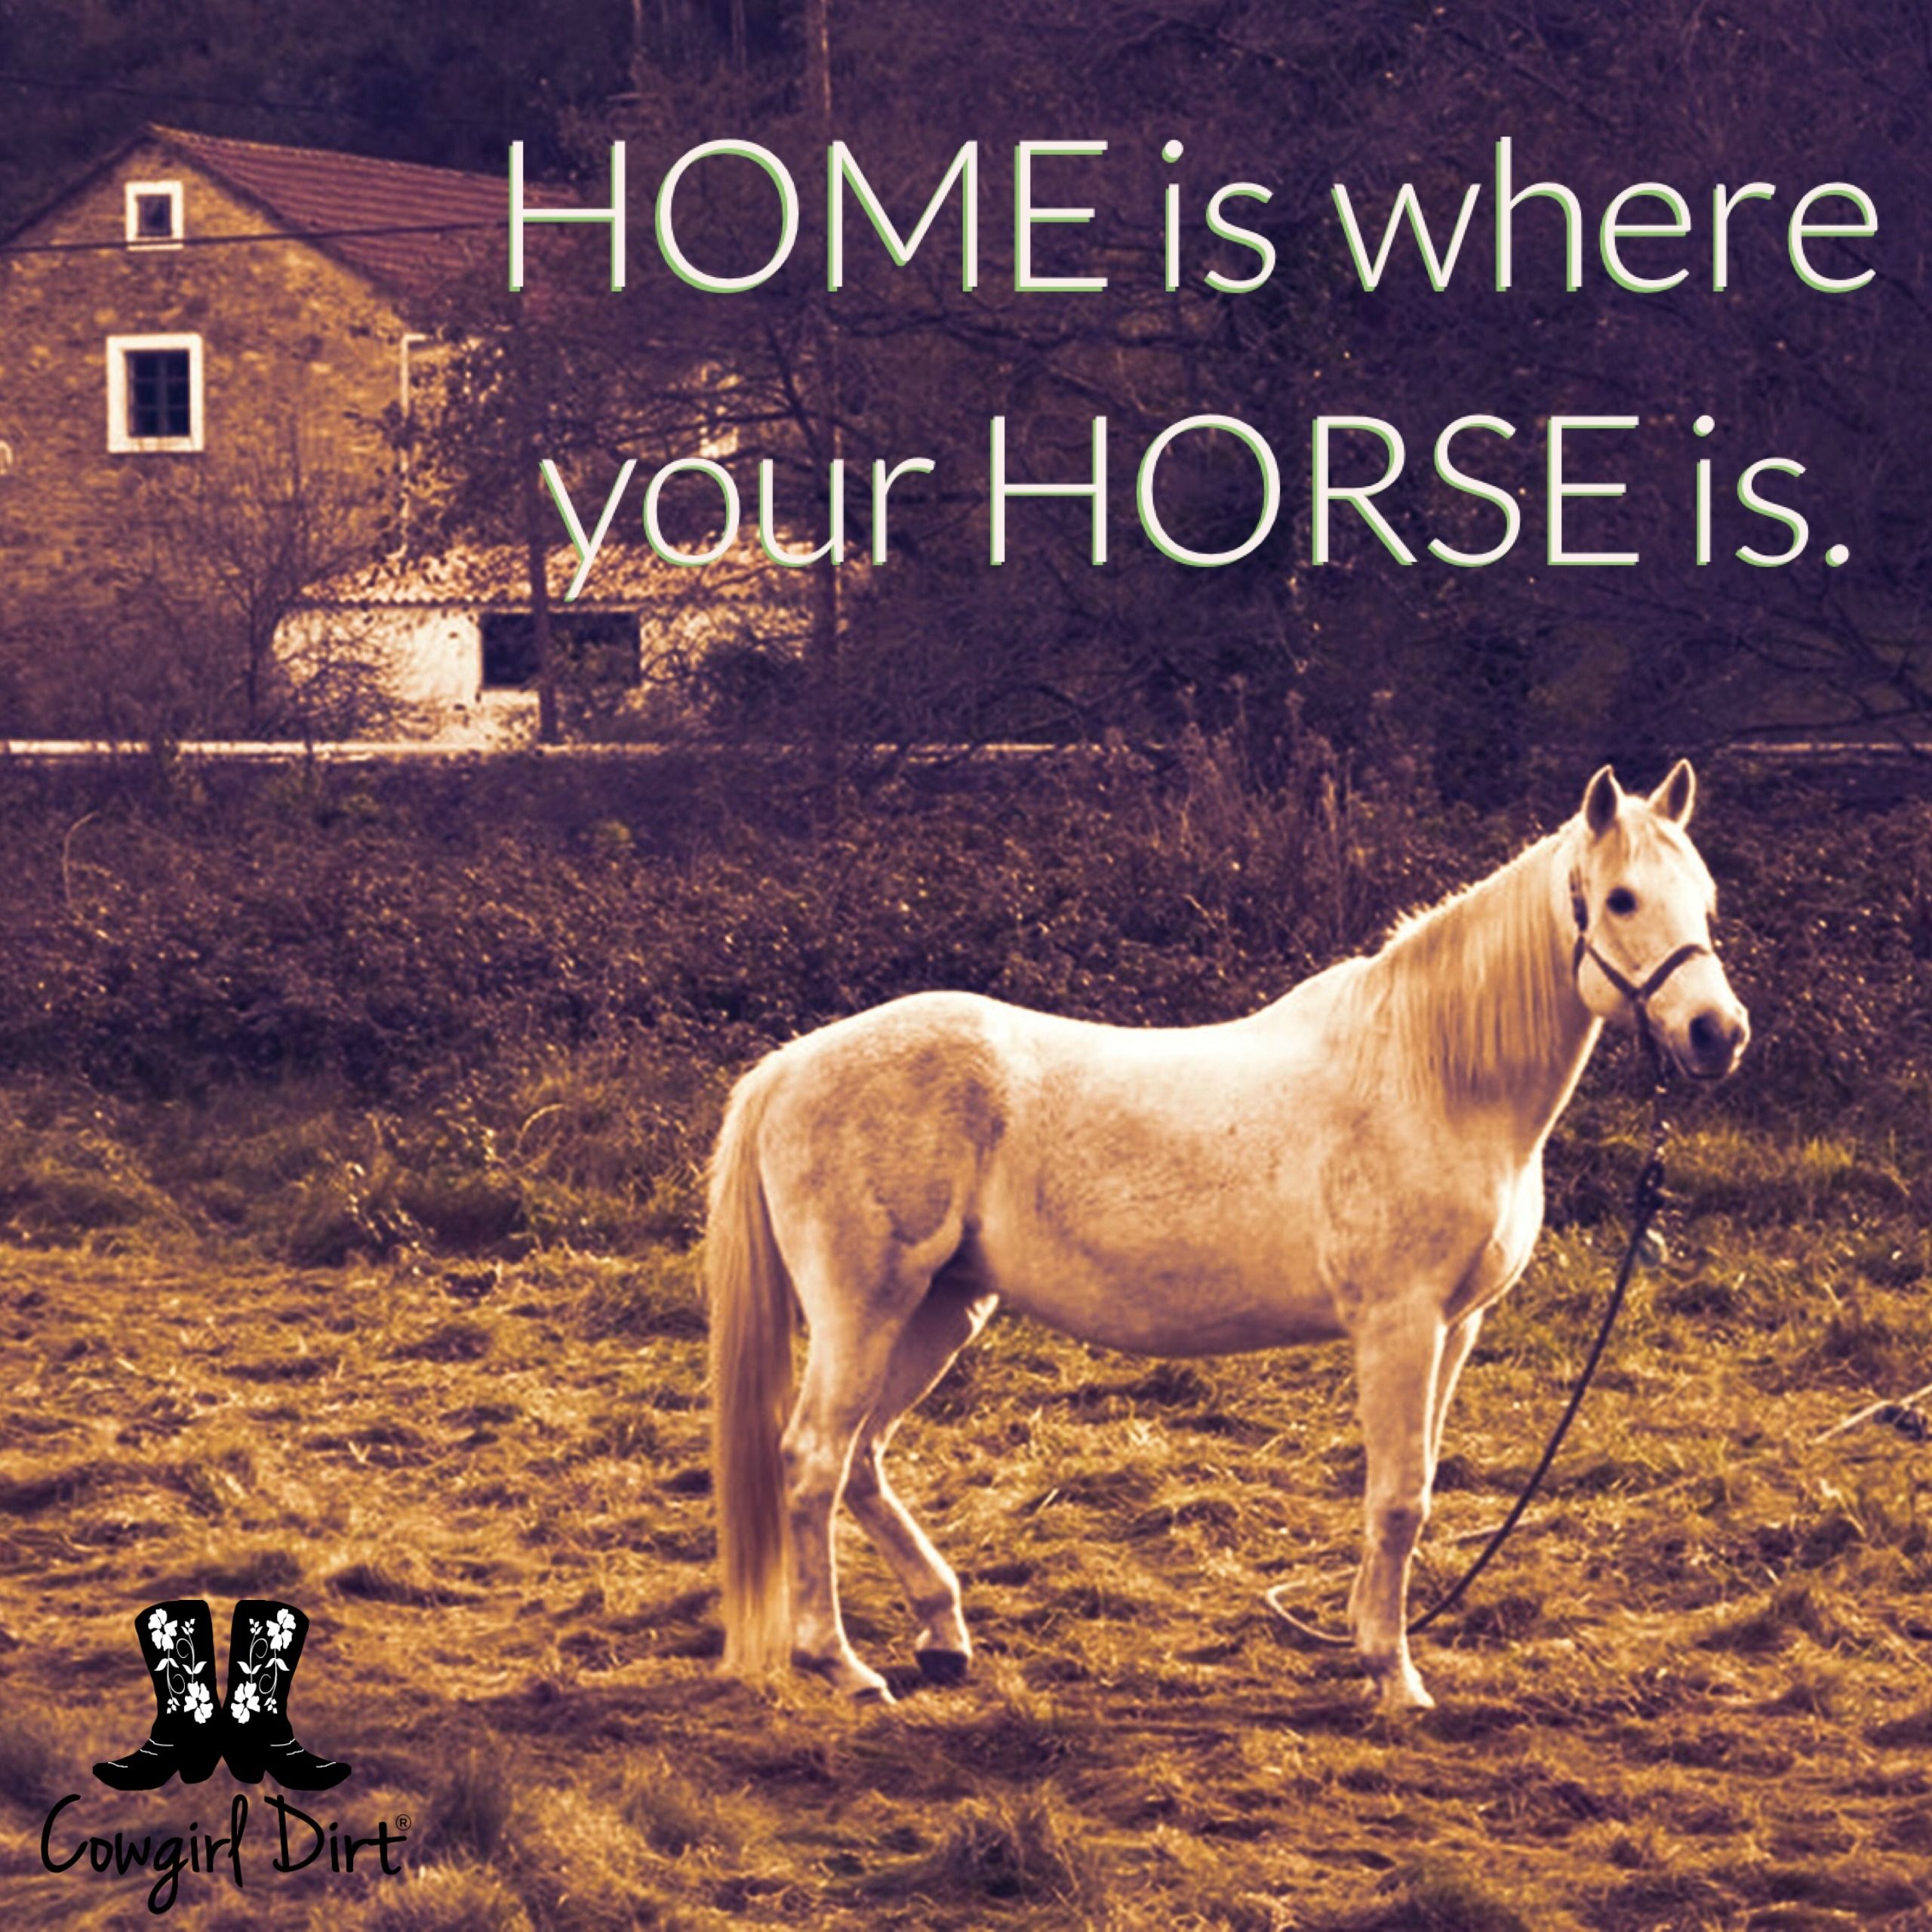 Cowgirl Dirt Quotes | Horses | Pinterest | Heste, Citater ...